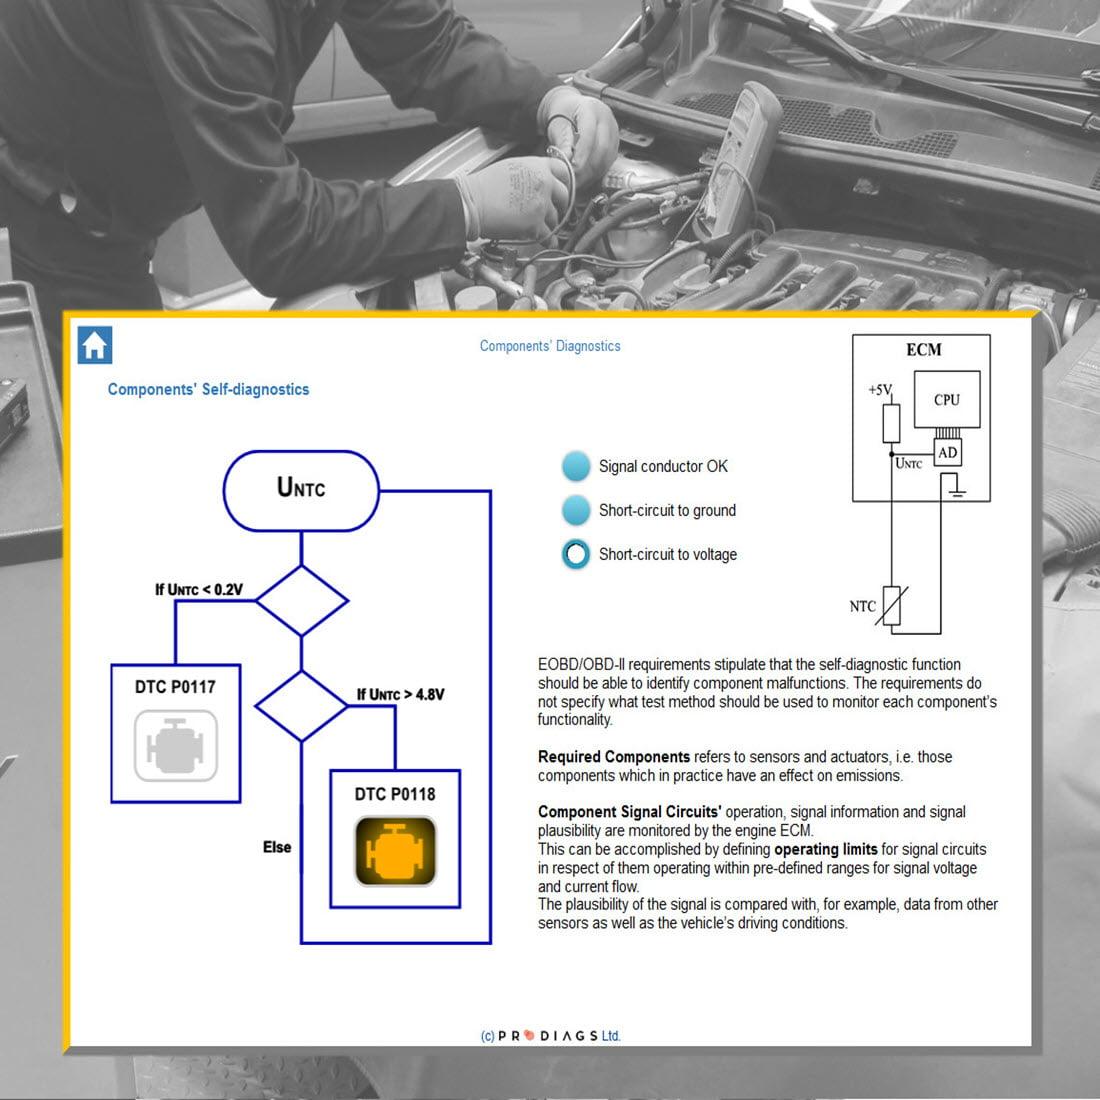 Eobd Obd Ii Self Diagnostics Online Training For Sale Design Circuits